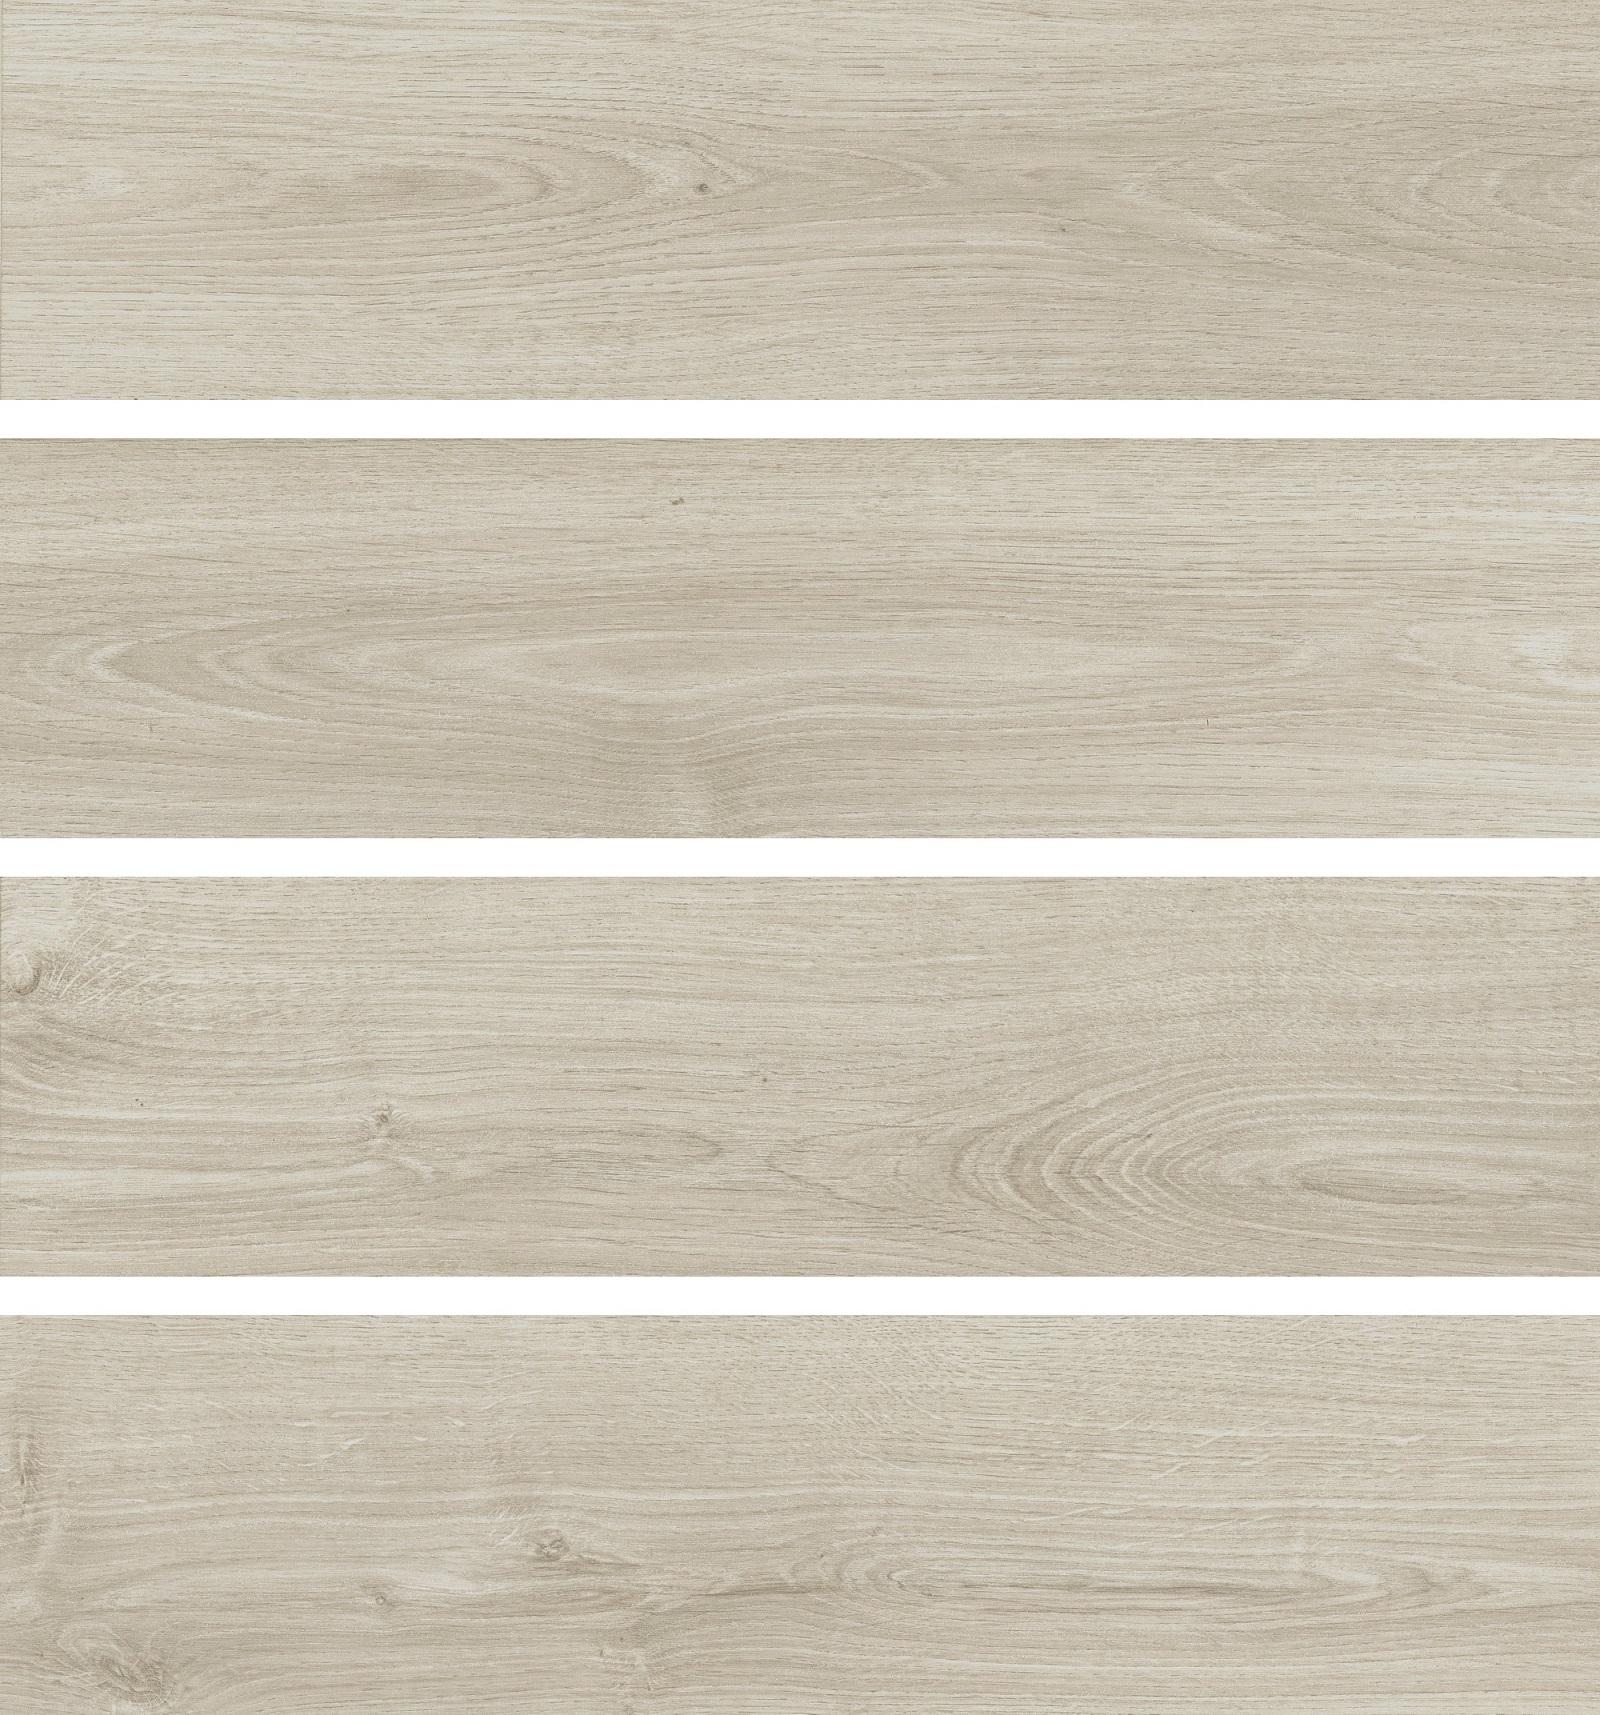 ceramic.md 15.1x60 muscat light beige 1 1